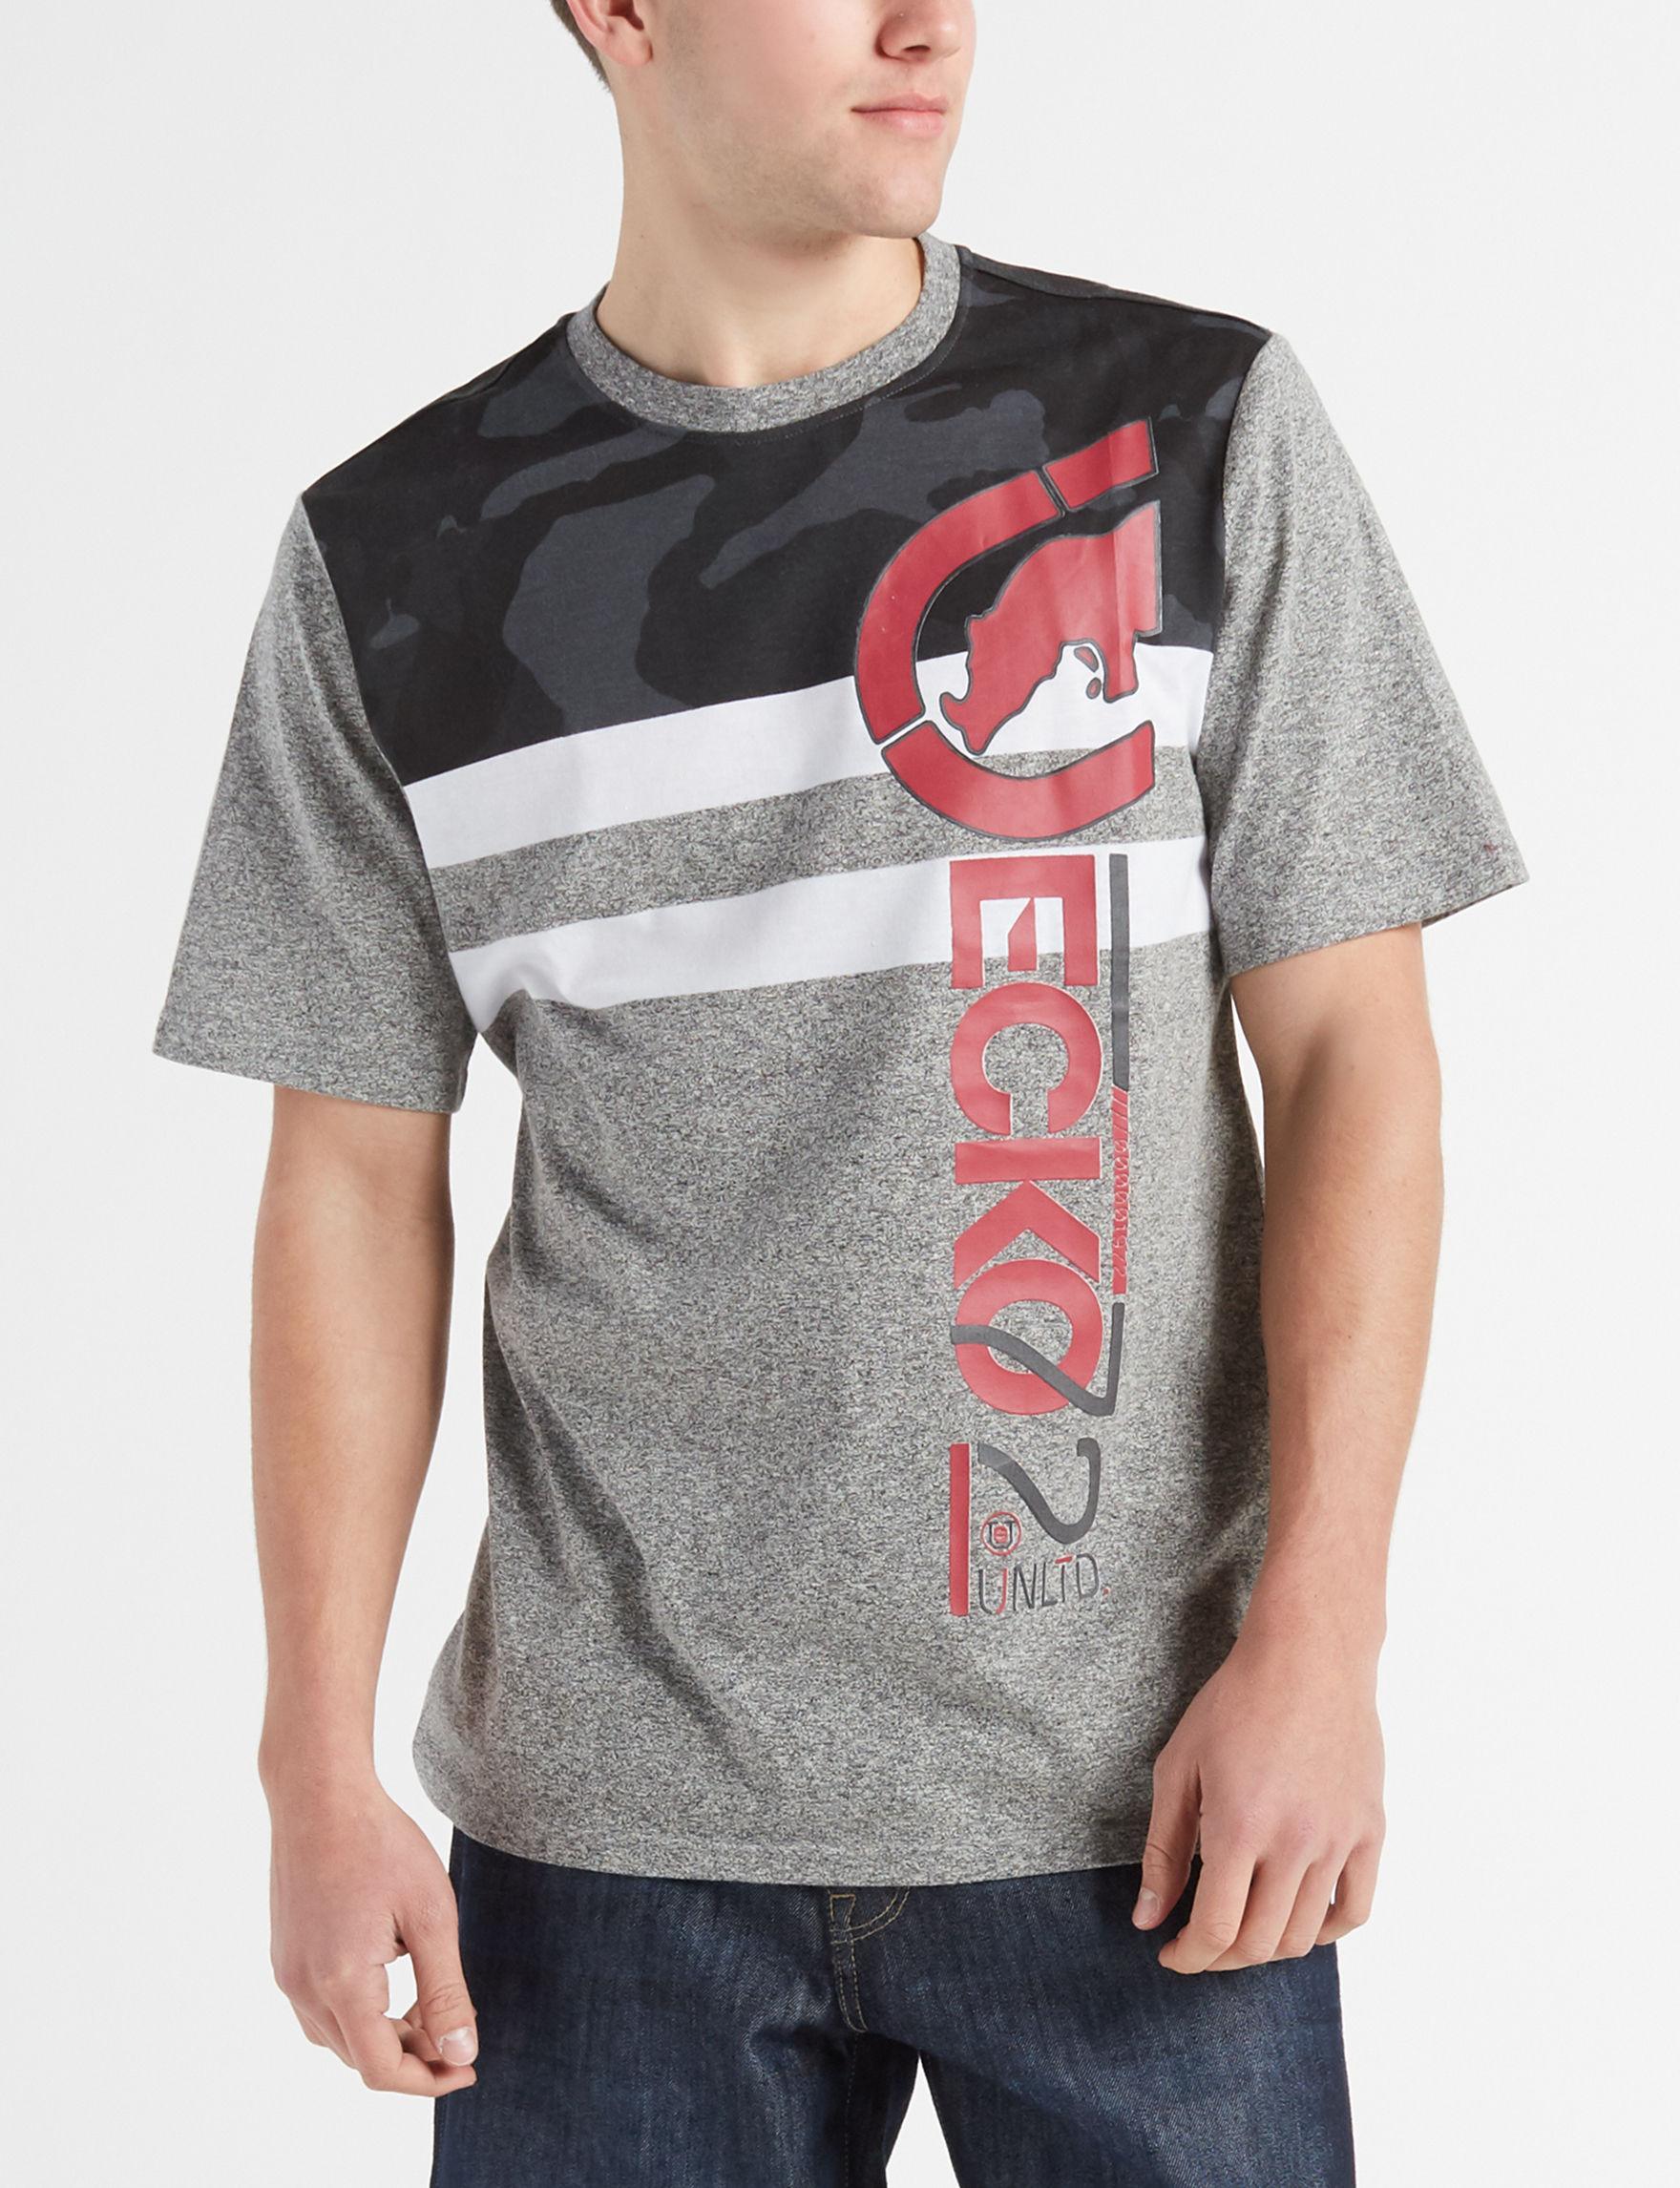 Ecko Grey / Multi Tees & Tanks